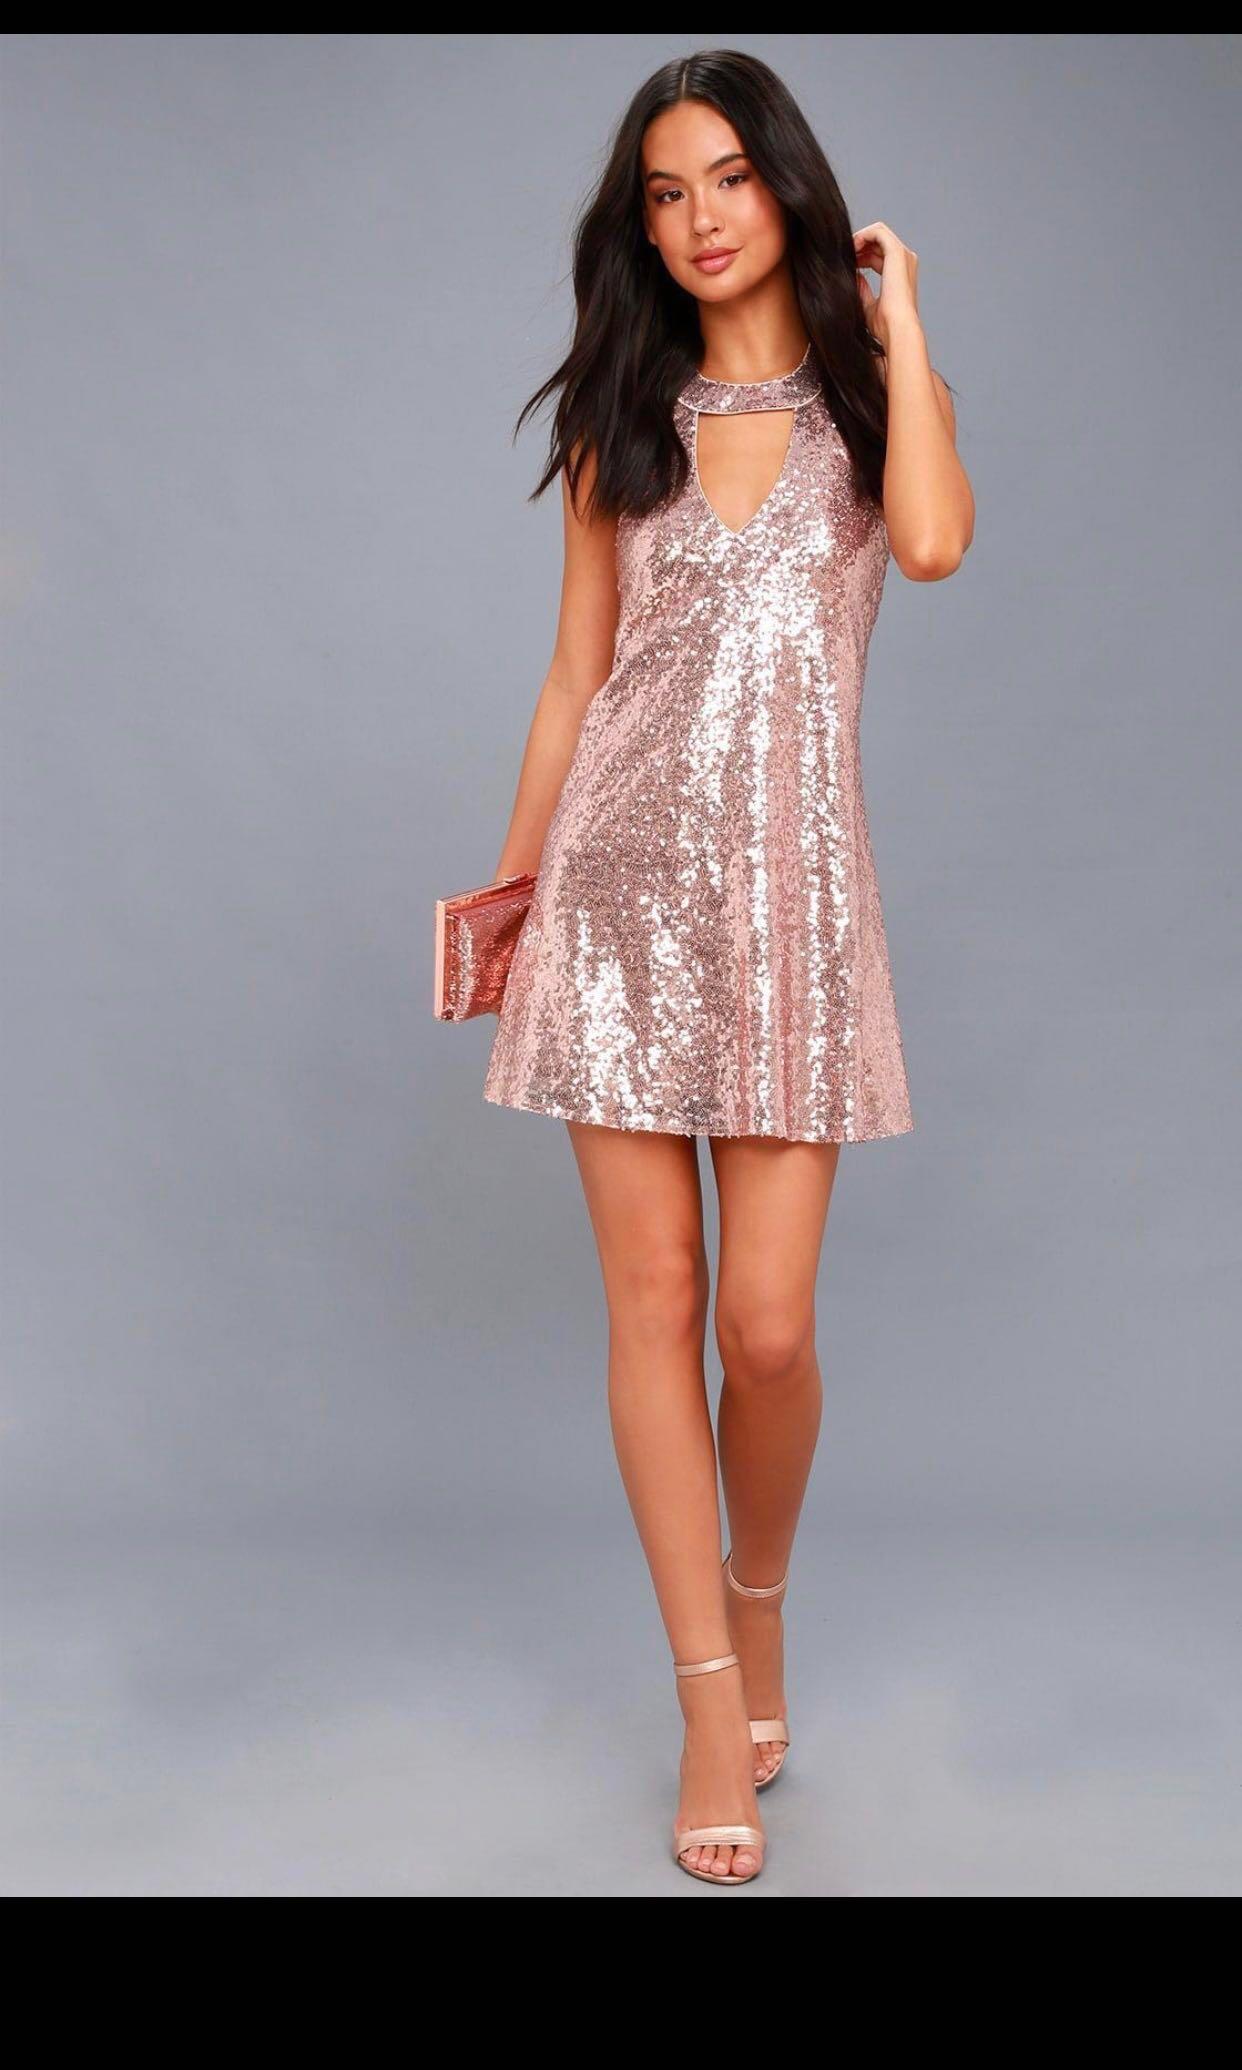 e54d440e529 Rose gold sequin dress